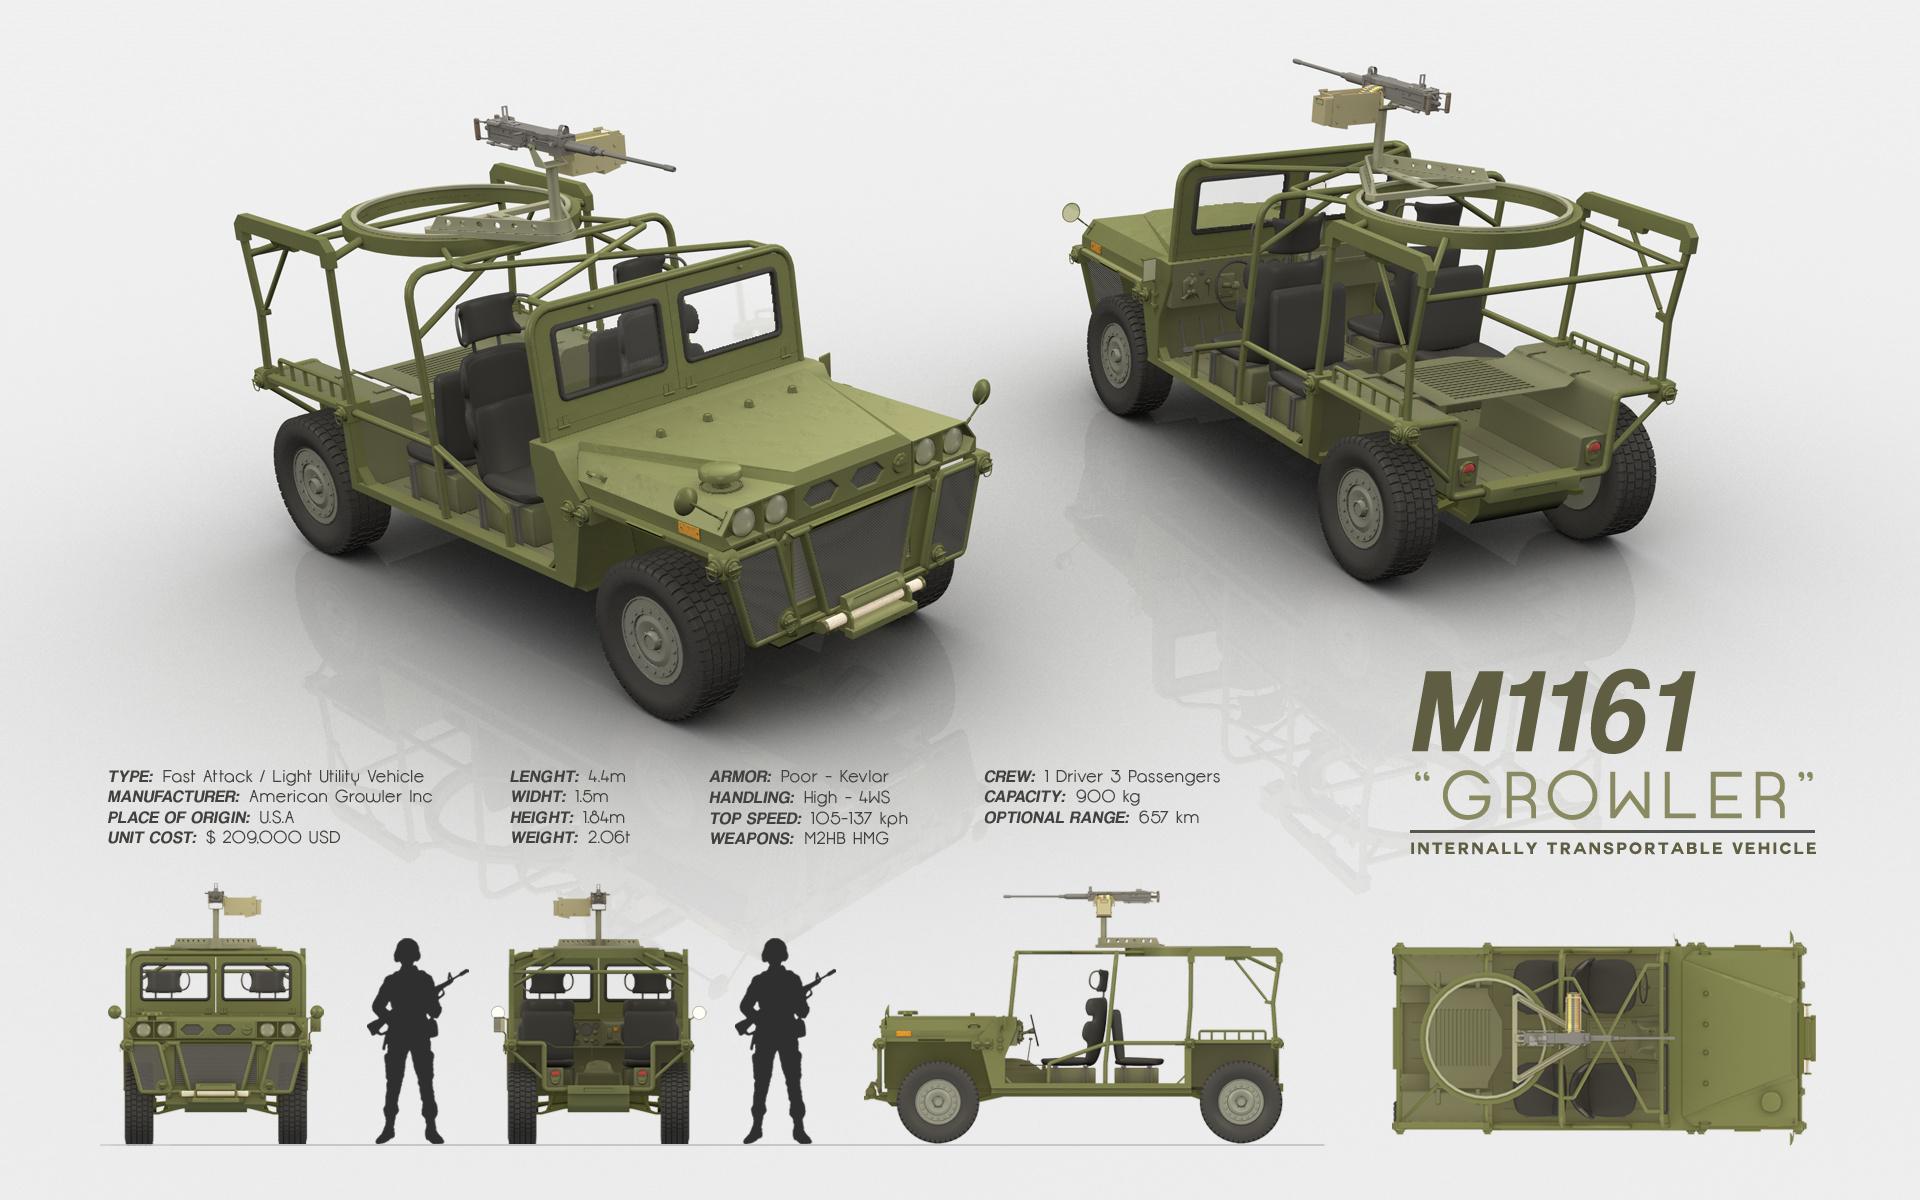 M1161 GROWLER - Internally Transportable Vehicle by cr8g